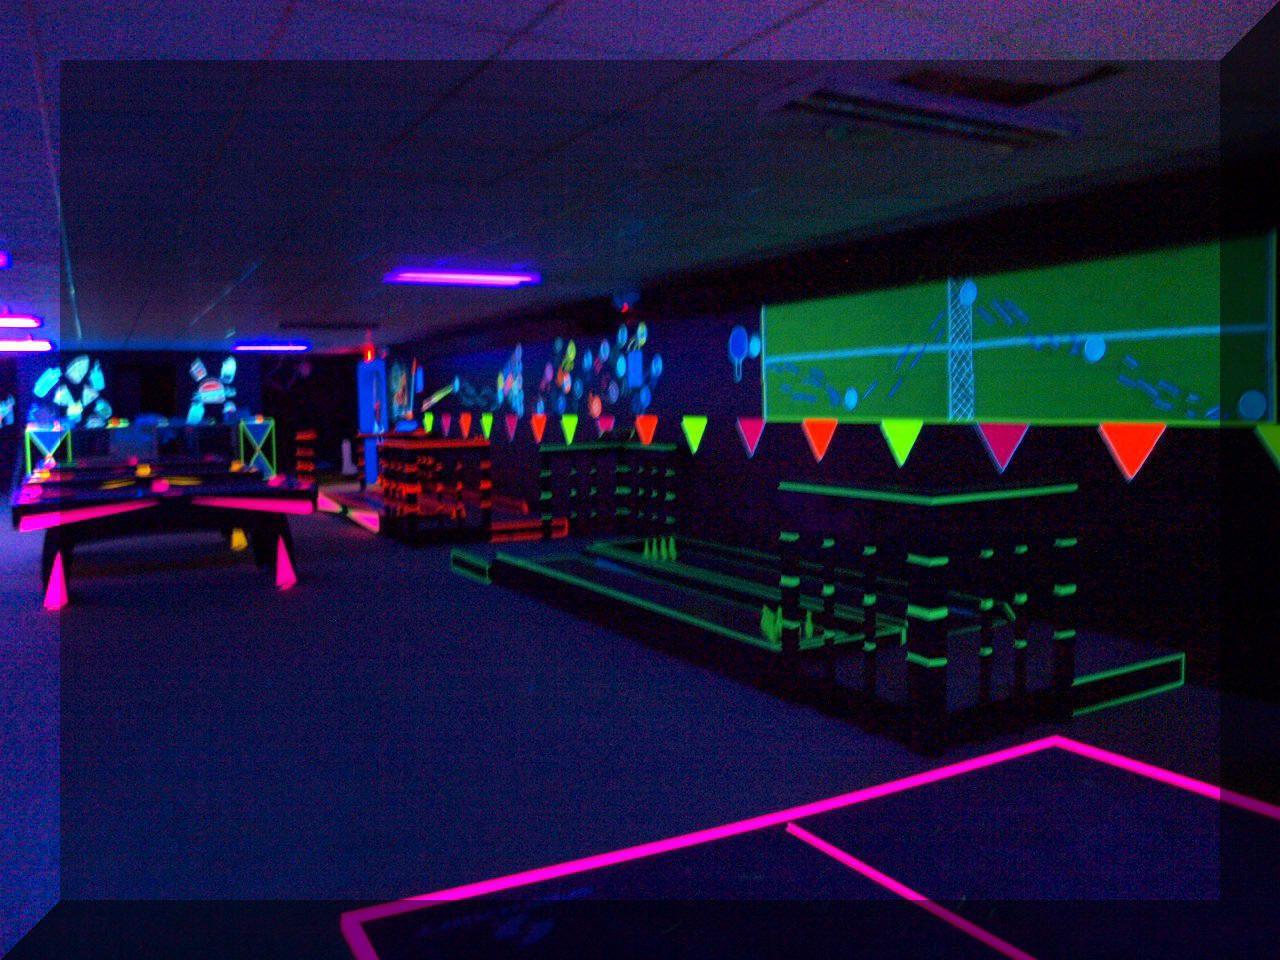 Bedroom glow blacklight party black lights blacklight bedroom - Game Room Inspiration Love